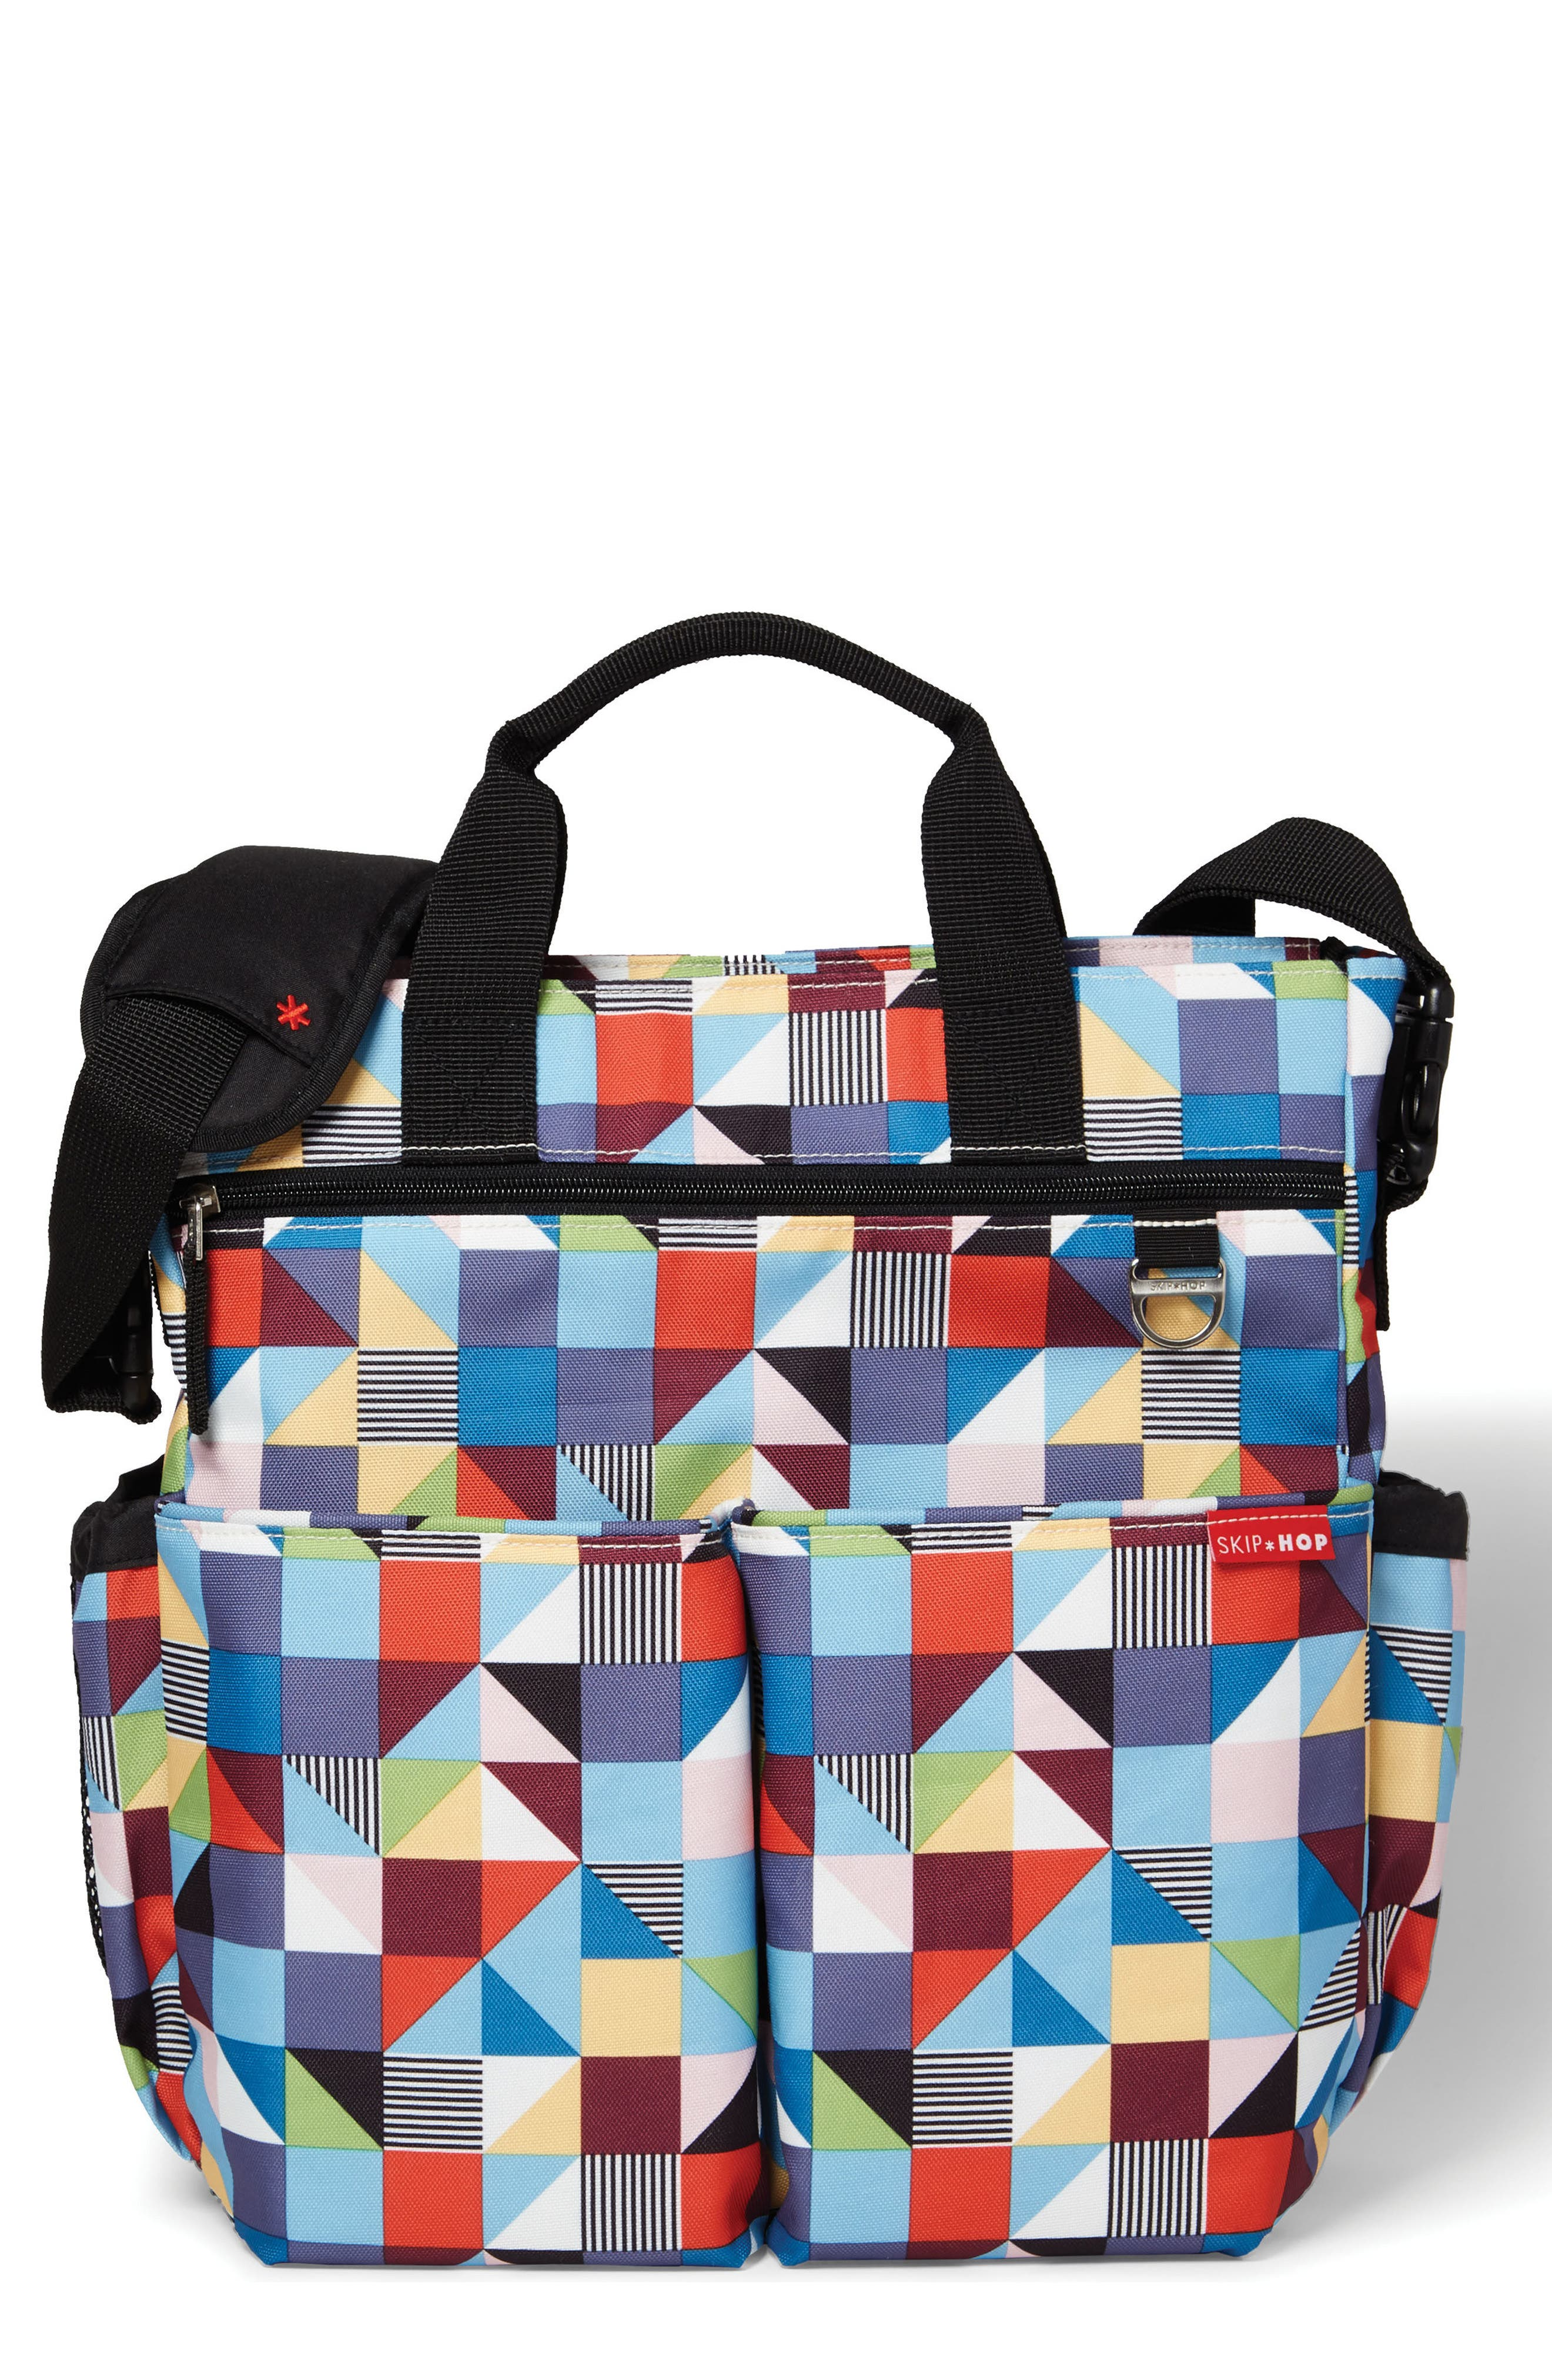 Skip Hop 'Duo Signature' Diaper Bag